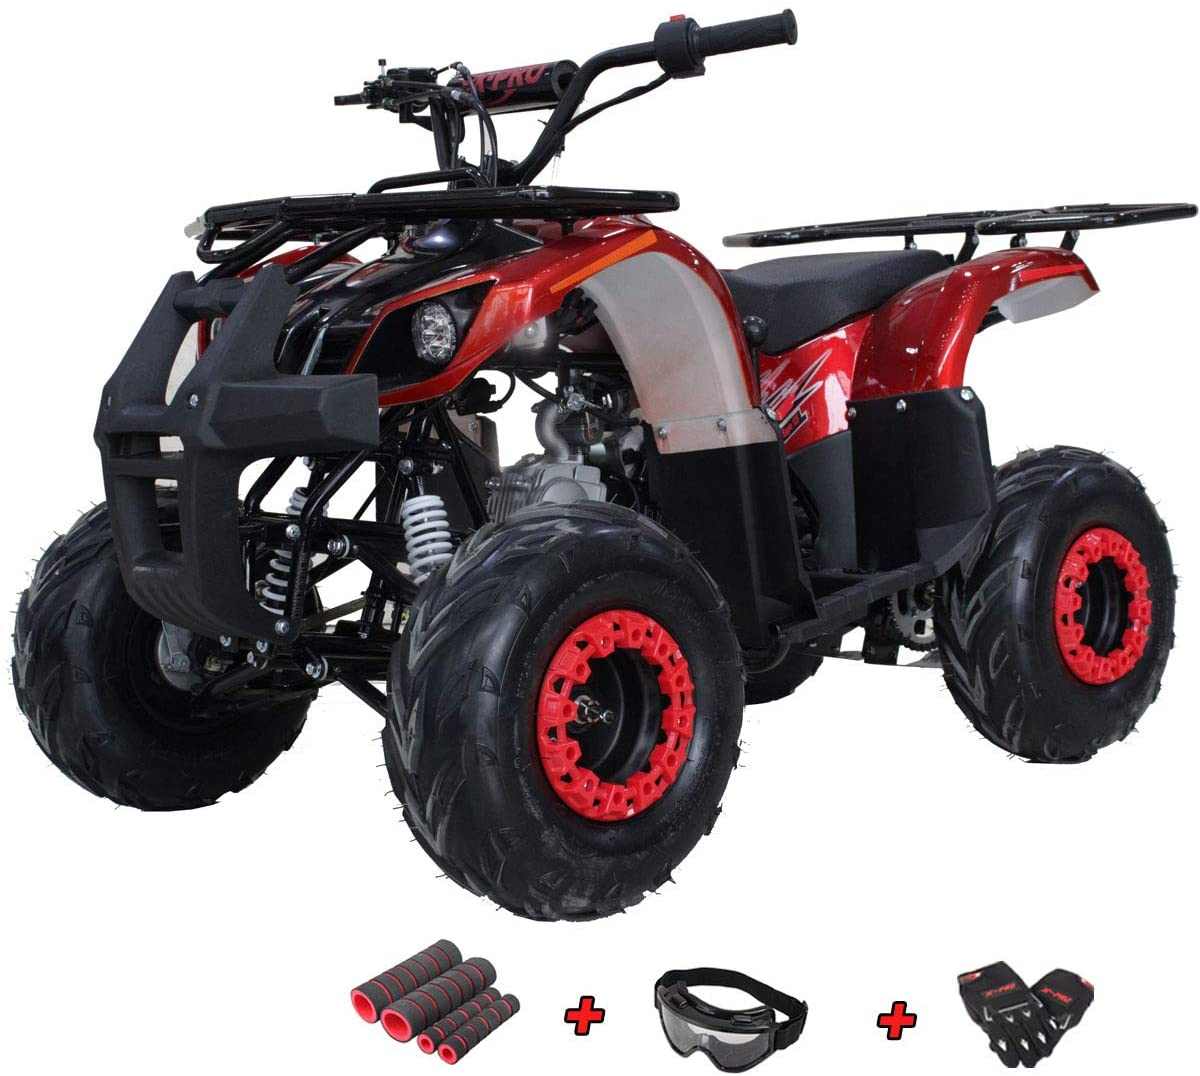 X-PRO Eagle 125 ATV Quad Youth 4 Wheeler ATVs Kid Size ATV 4 Wheelers 125cc Big Boys ATVs Quads with Gloves, Goggle and Handgrip(Burgundy)